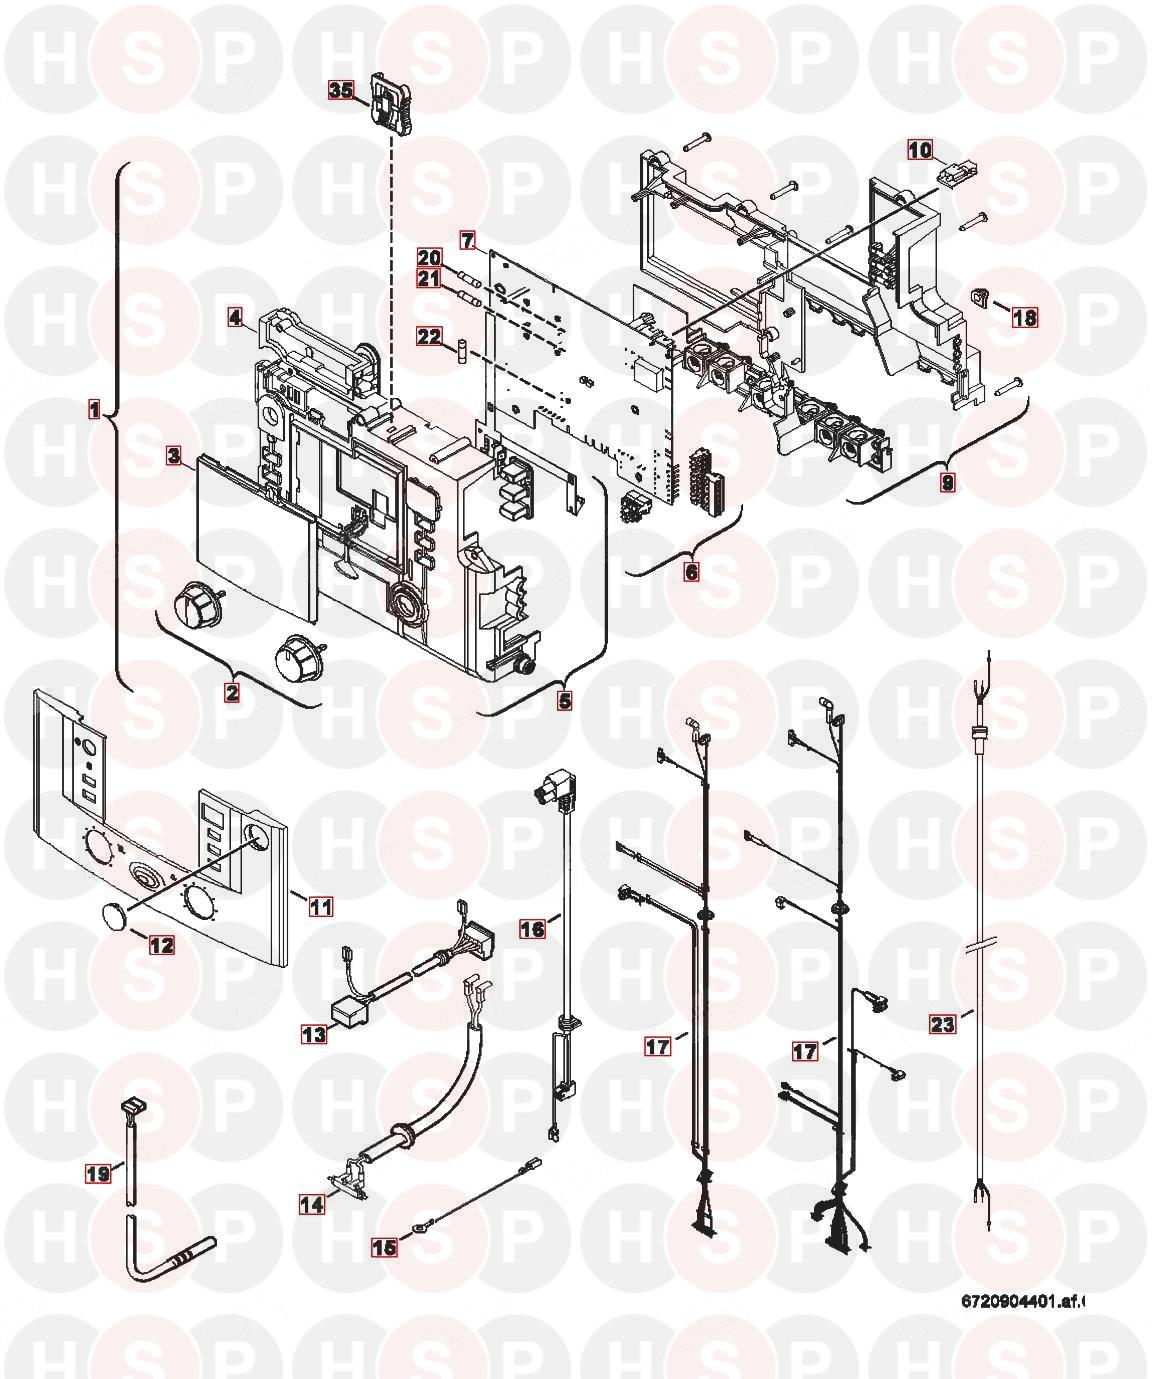 Worcester GREENSTAR 34CDI CLASSIC ERP Appliance Diagram